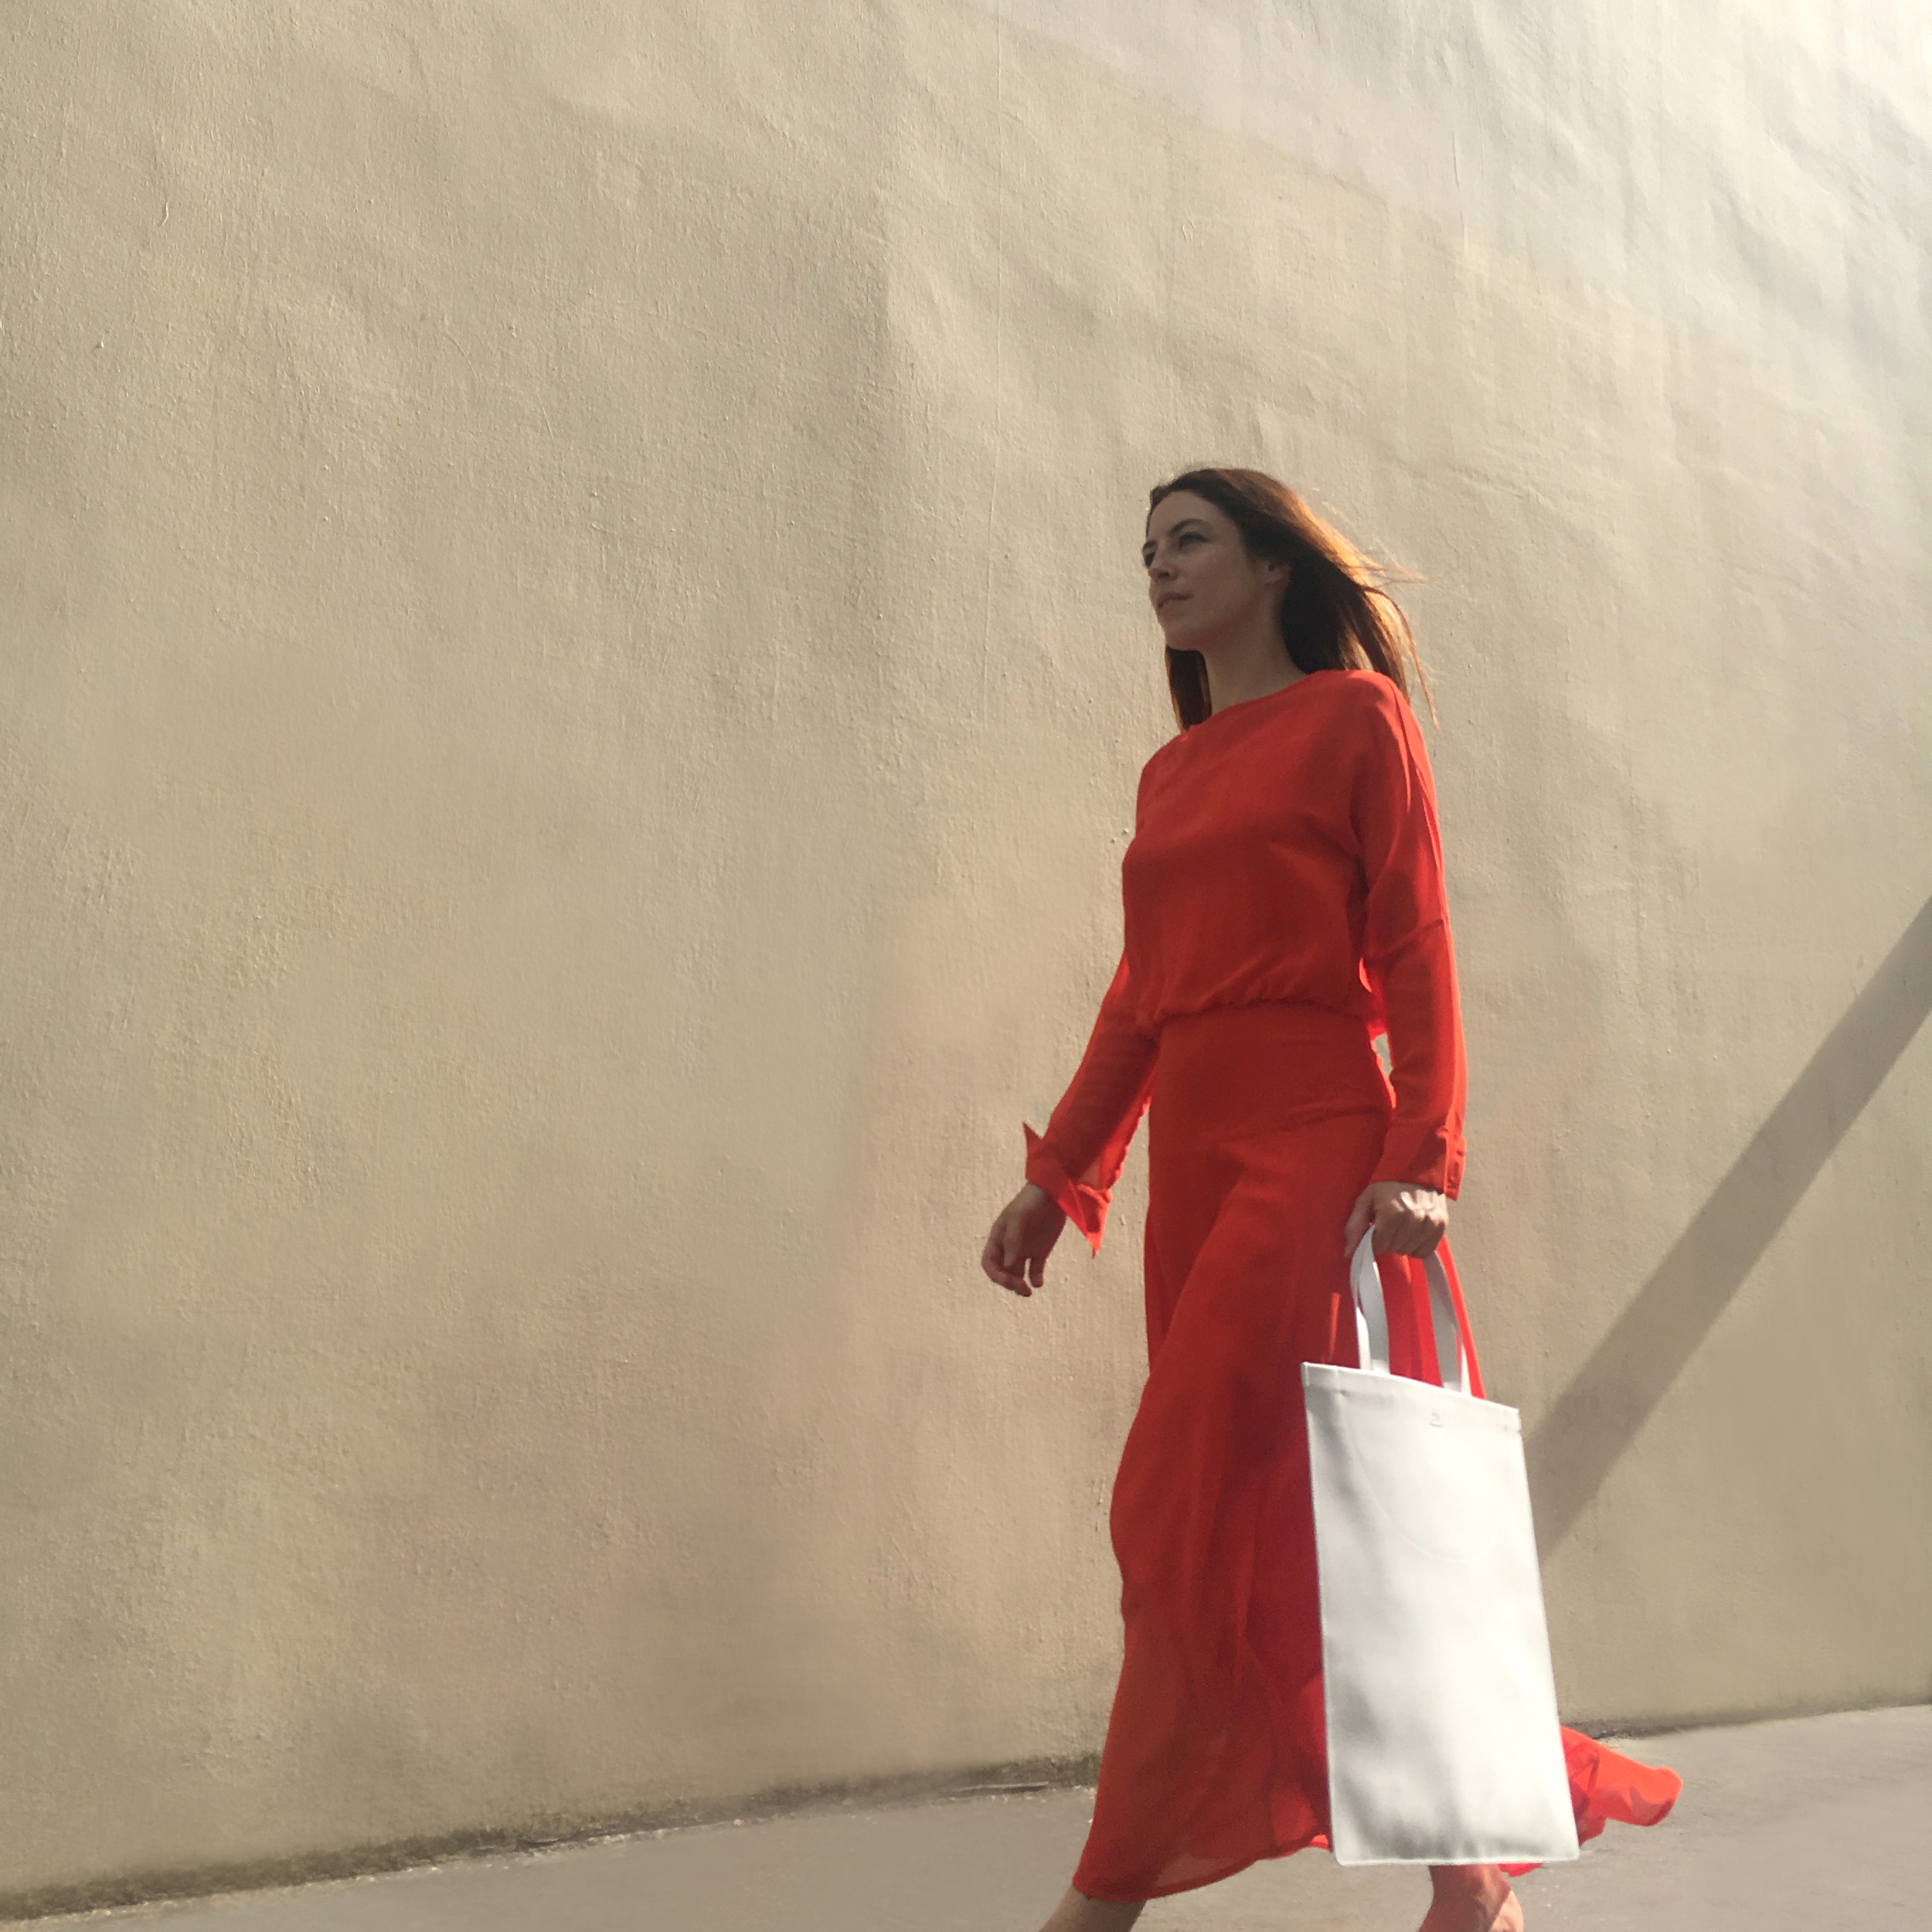 11a reddress TOTE_BEABUEHLER .jpg